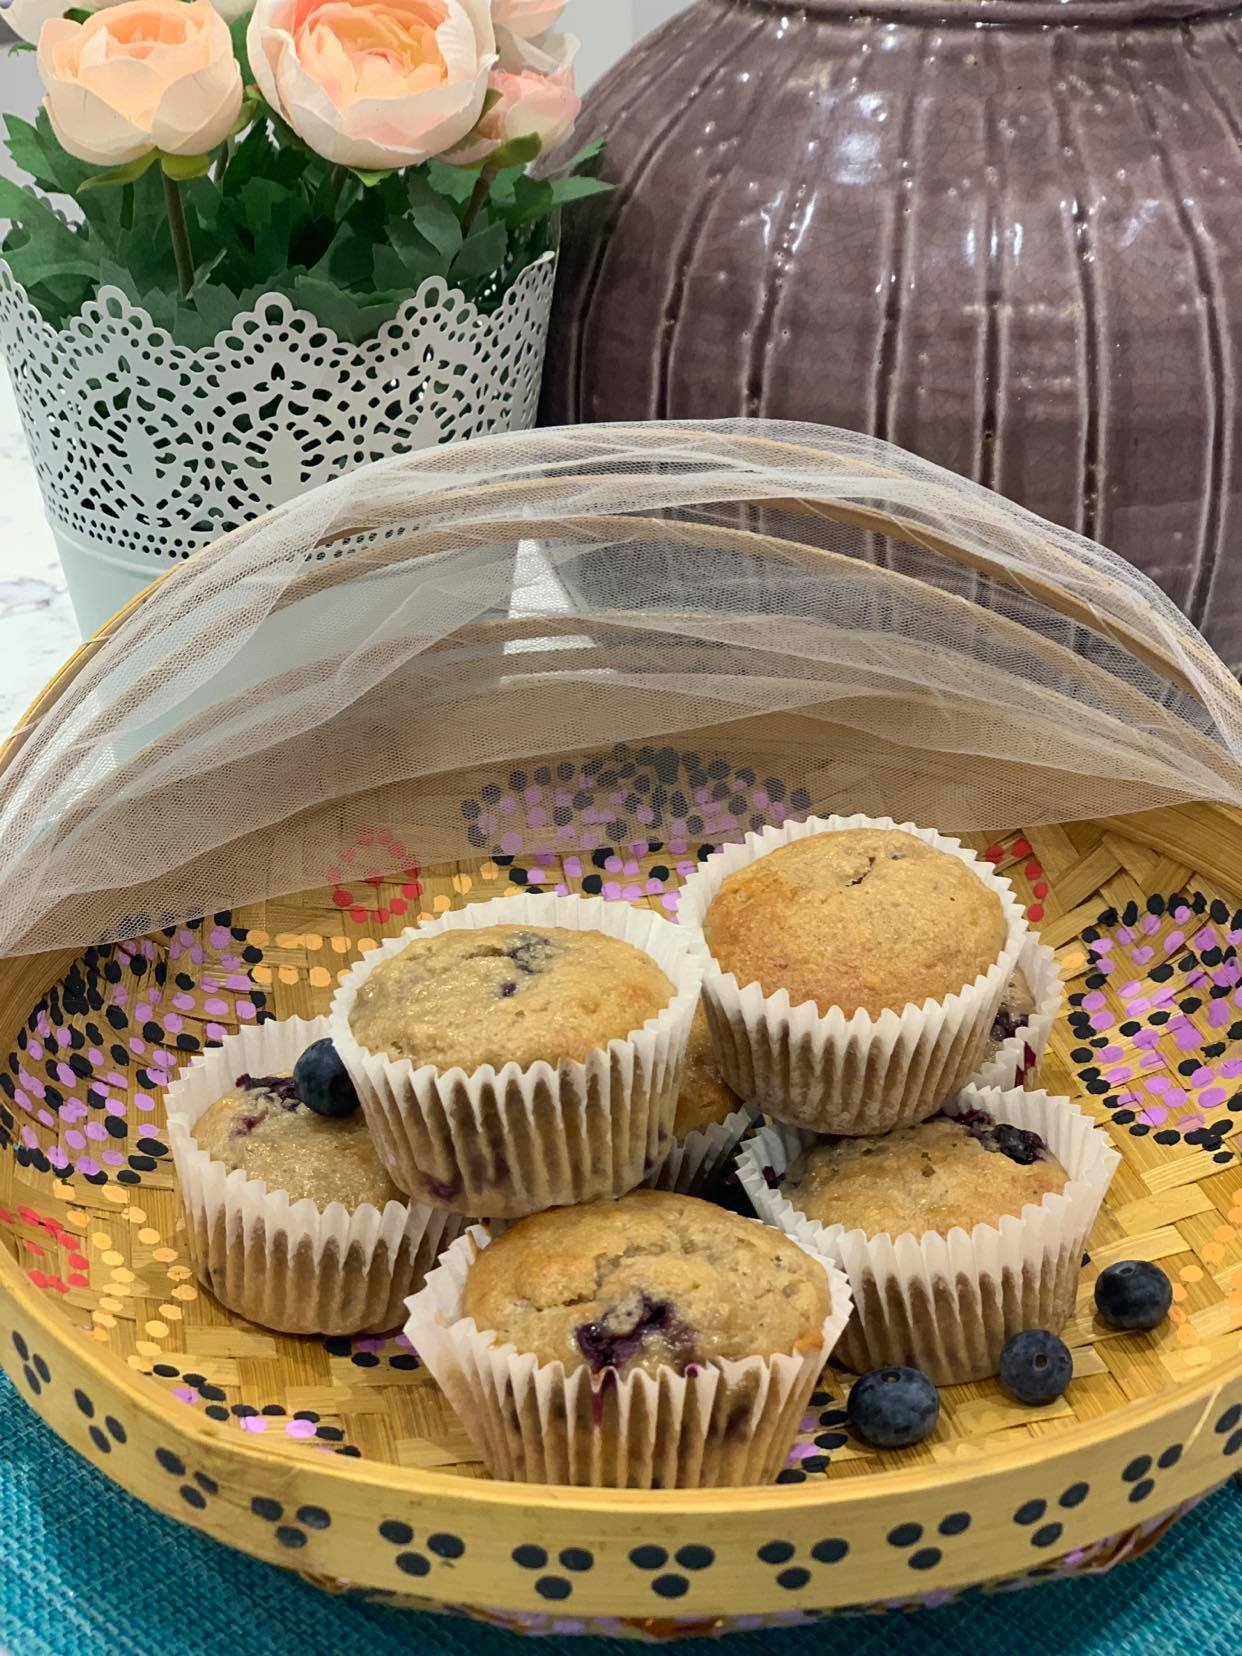 Homemade Banana and Blueberry Muffins